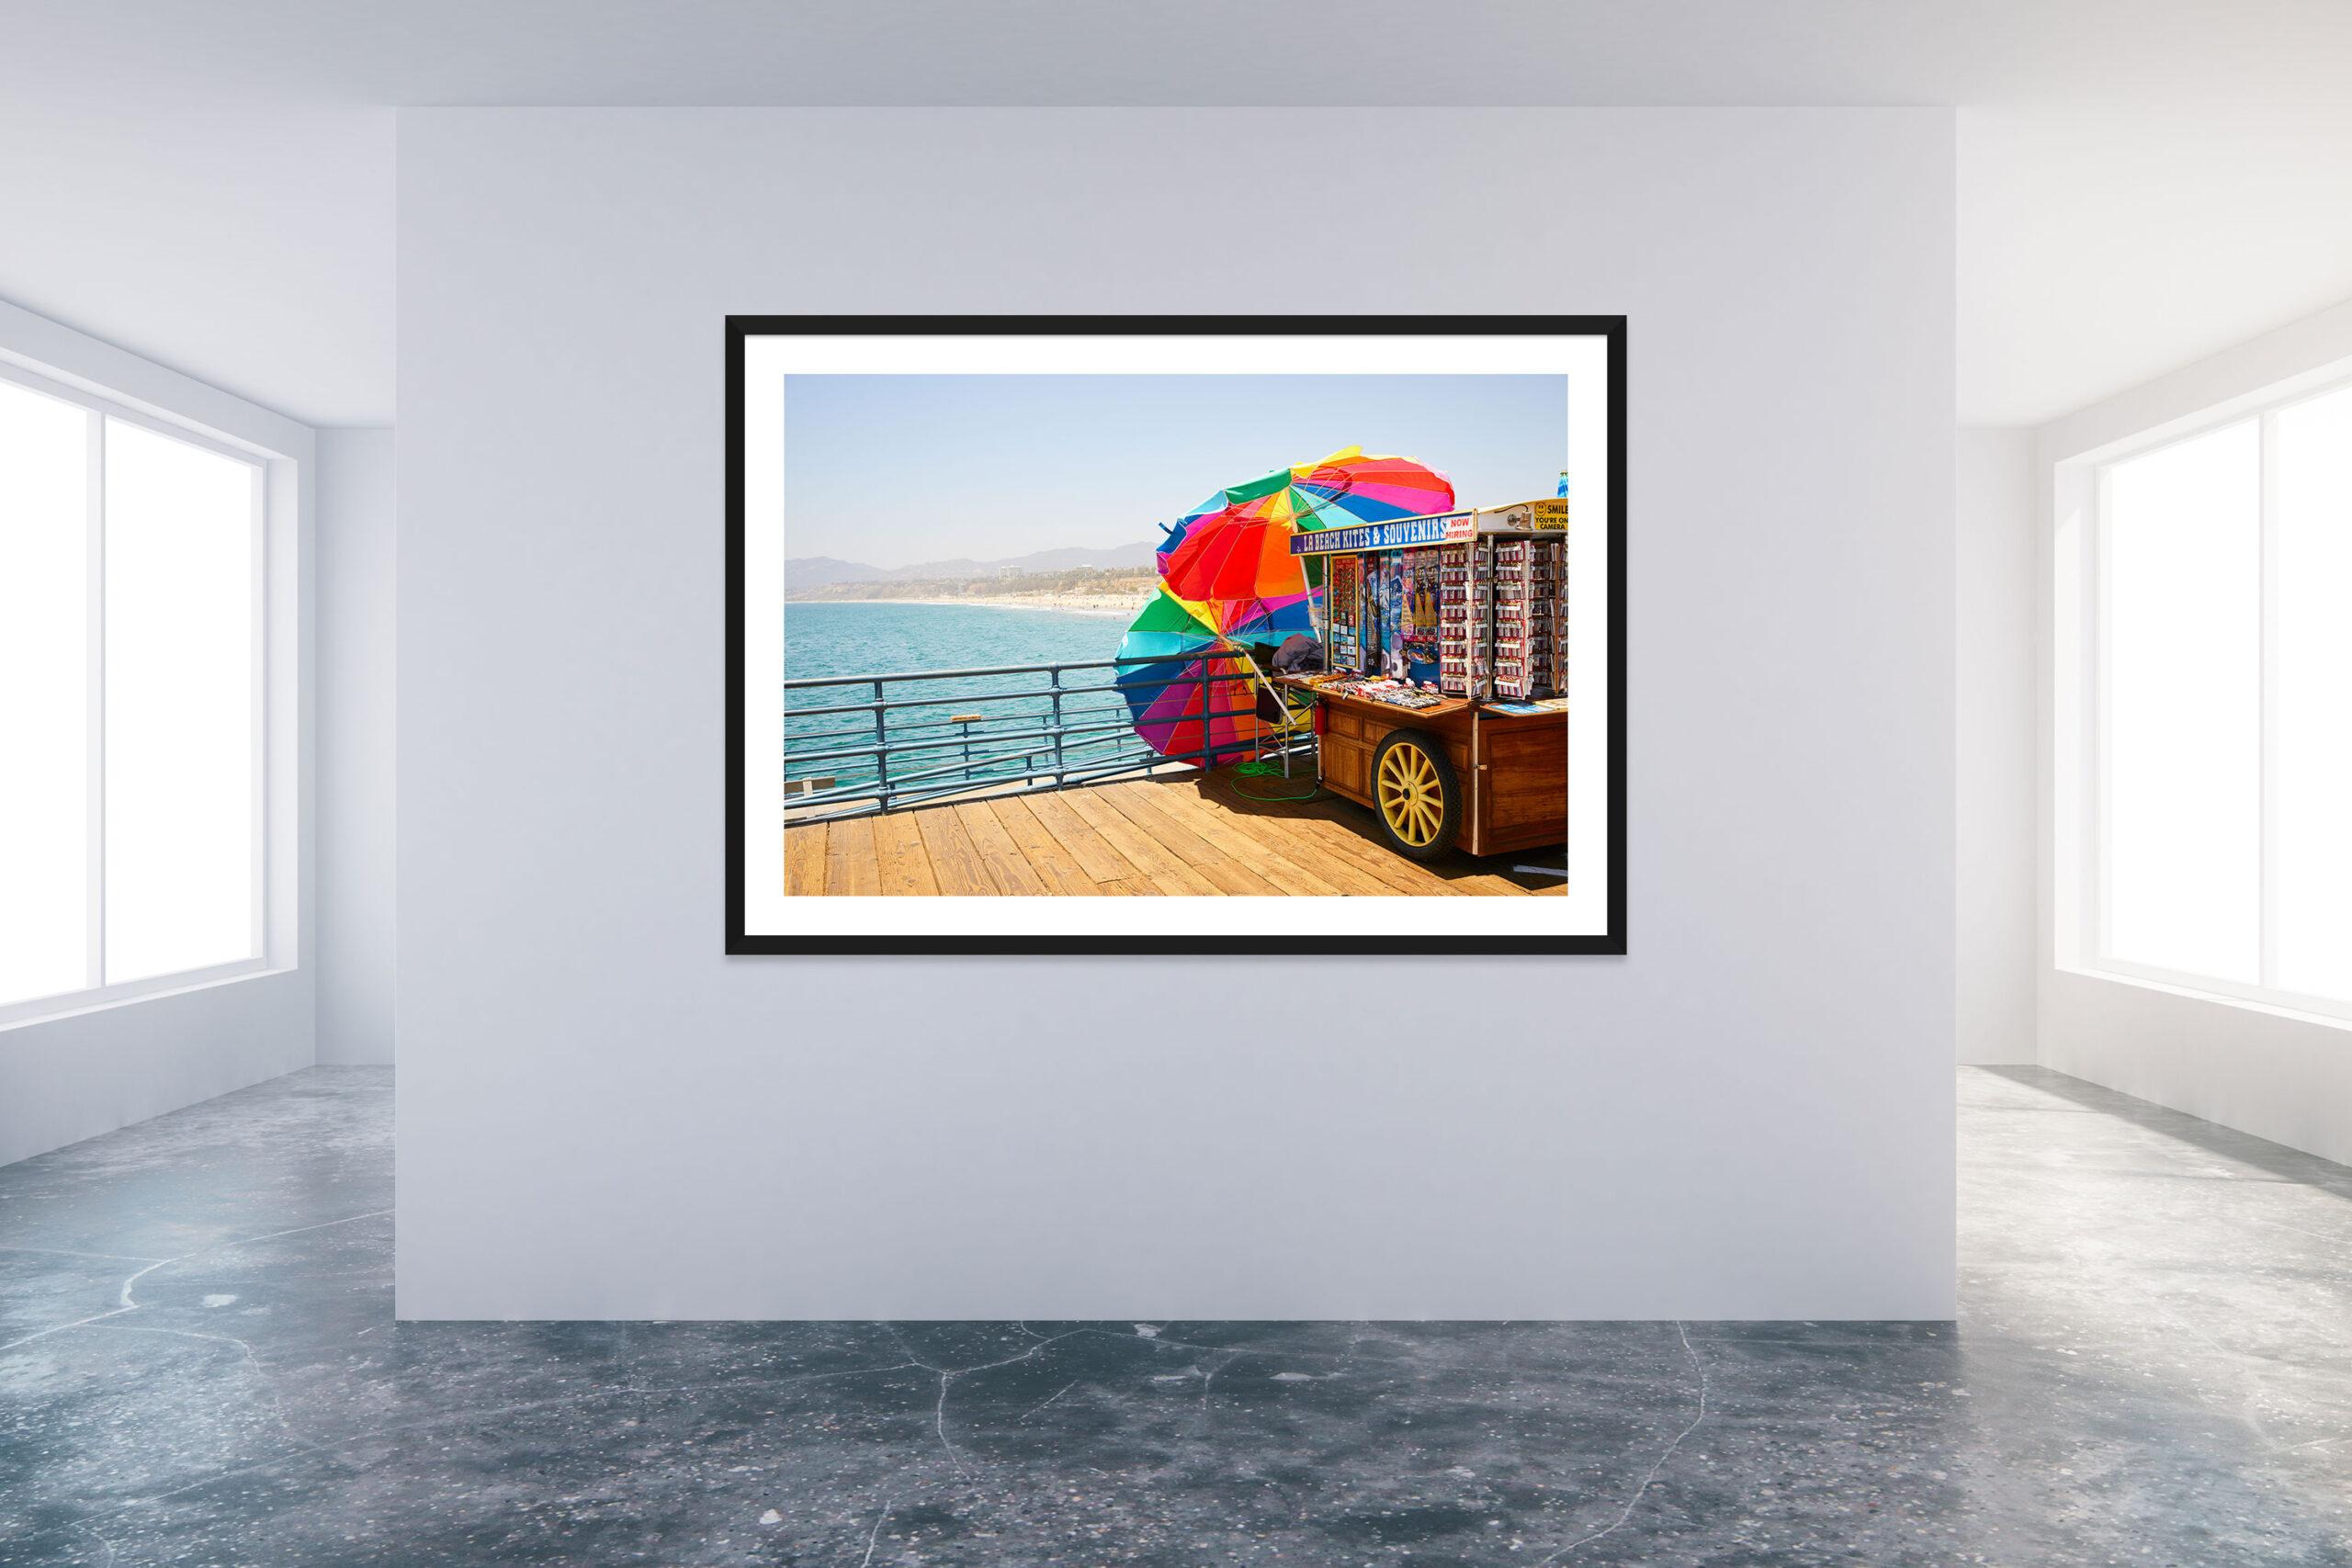 Santa Monica Pier 4 - Black Frame - Carnival Collection - Fine Art Photography by Toby Dixon